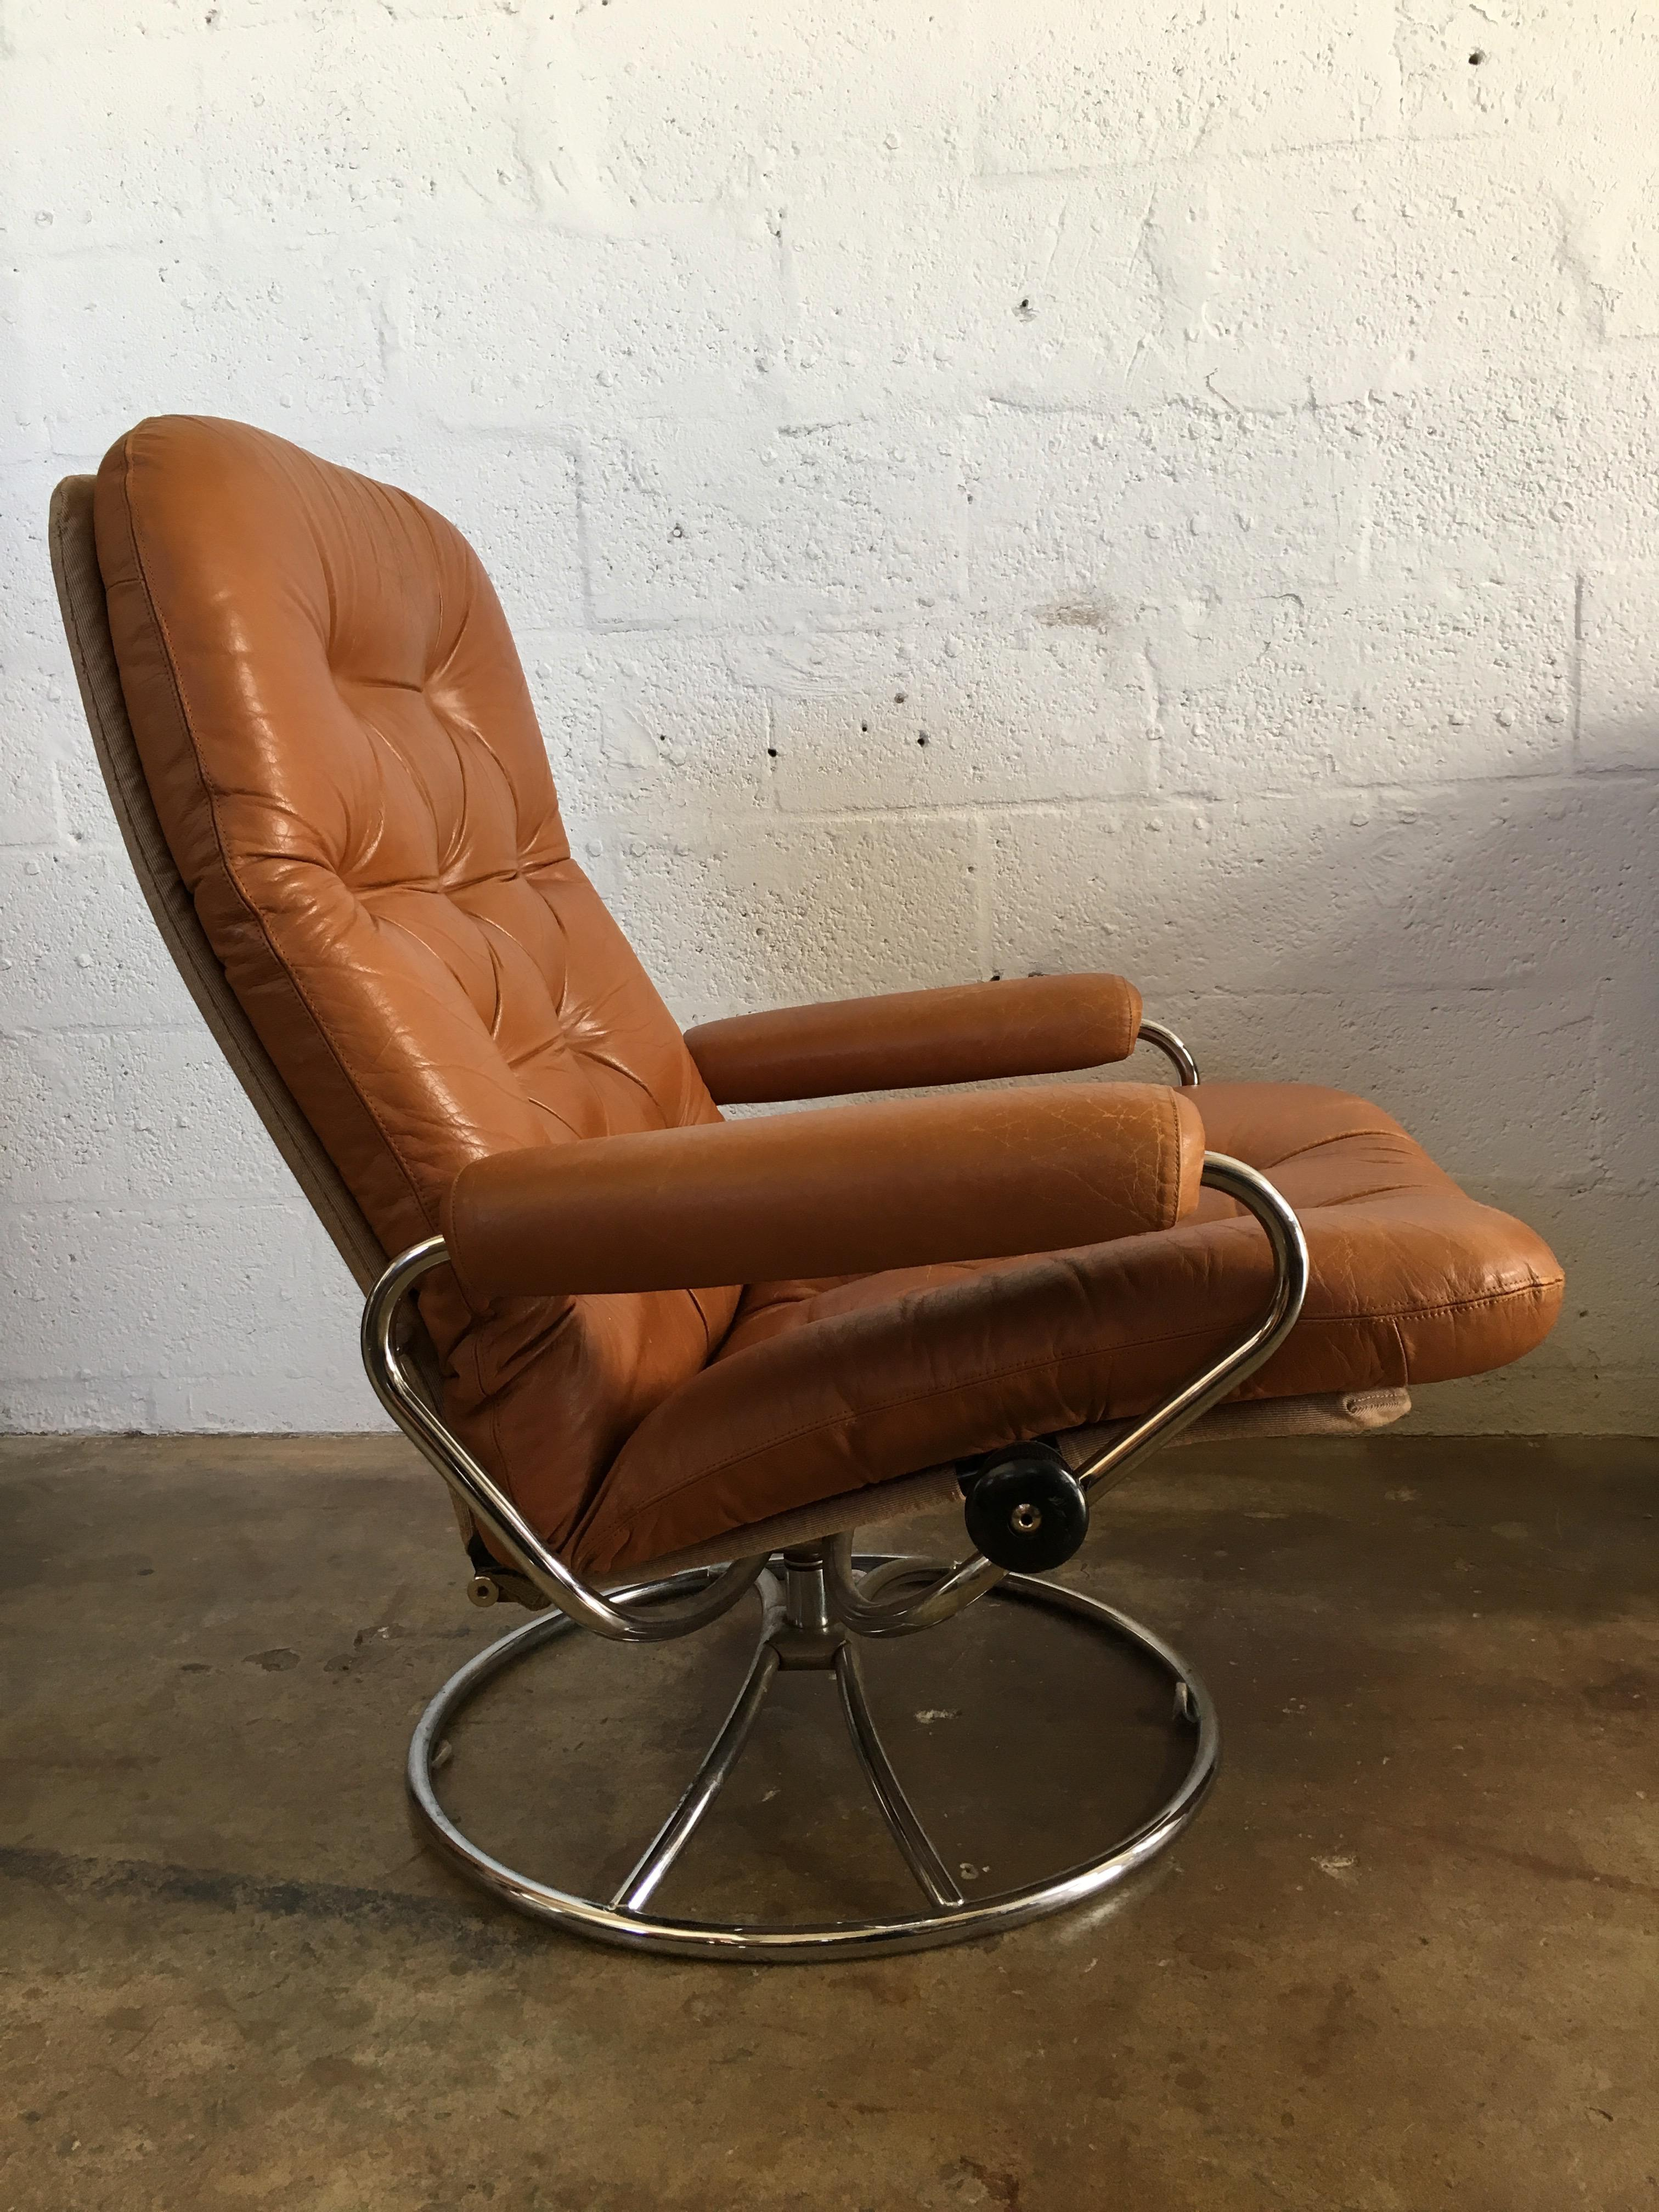 Vintage Mid-Century Modern Reclining Chair By Ekornes Stressless (A Pair) - Image  sc 1 st  Chairish & Vintage Mid-Century Modern Reclining Chair By Ekornes Stressless ... islam-shia.org